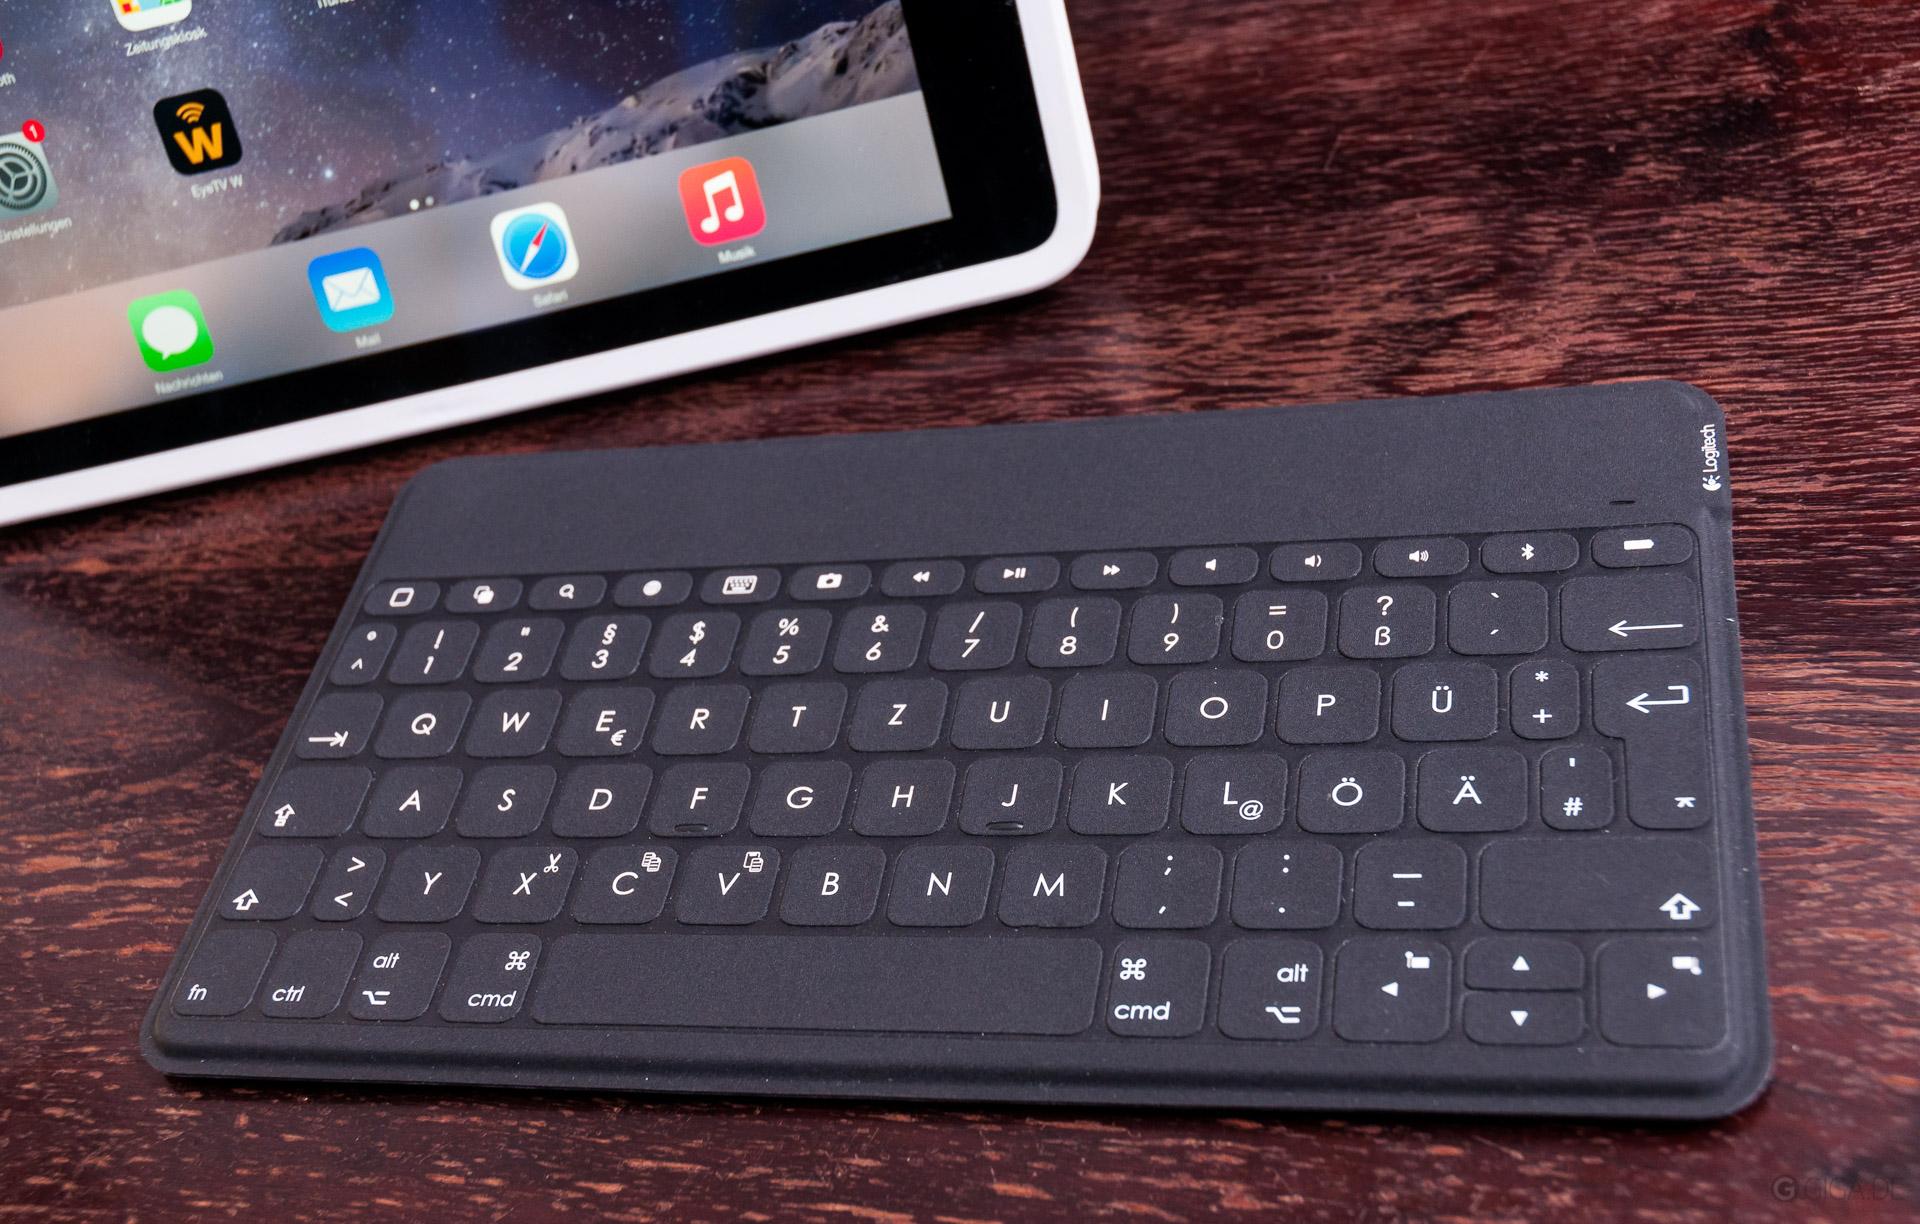 Atemberaubend Logitech Verdrahtete Tastatur Für Ipad Lightning ...